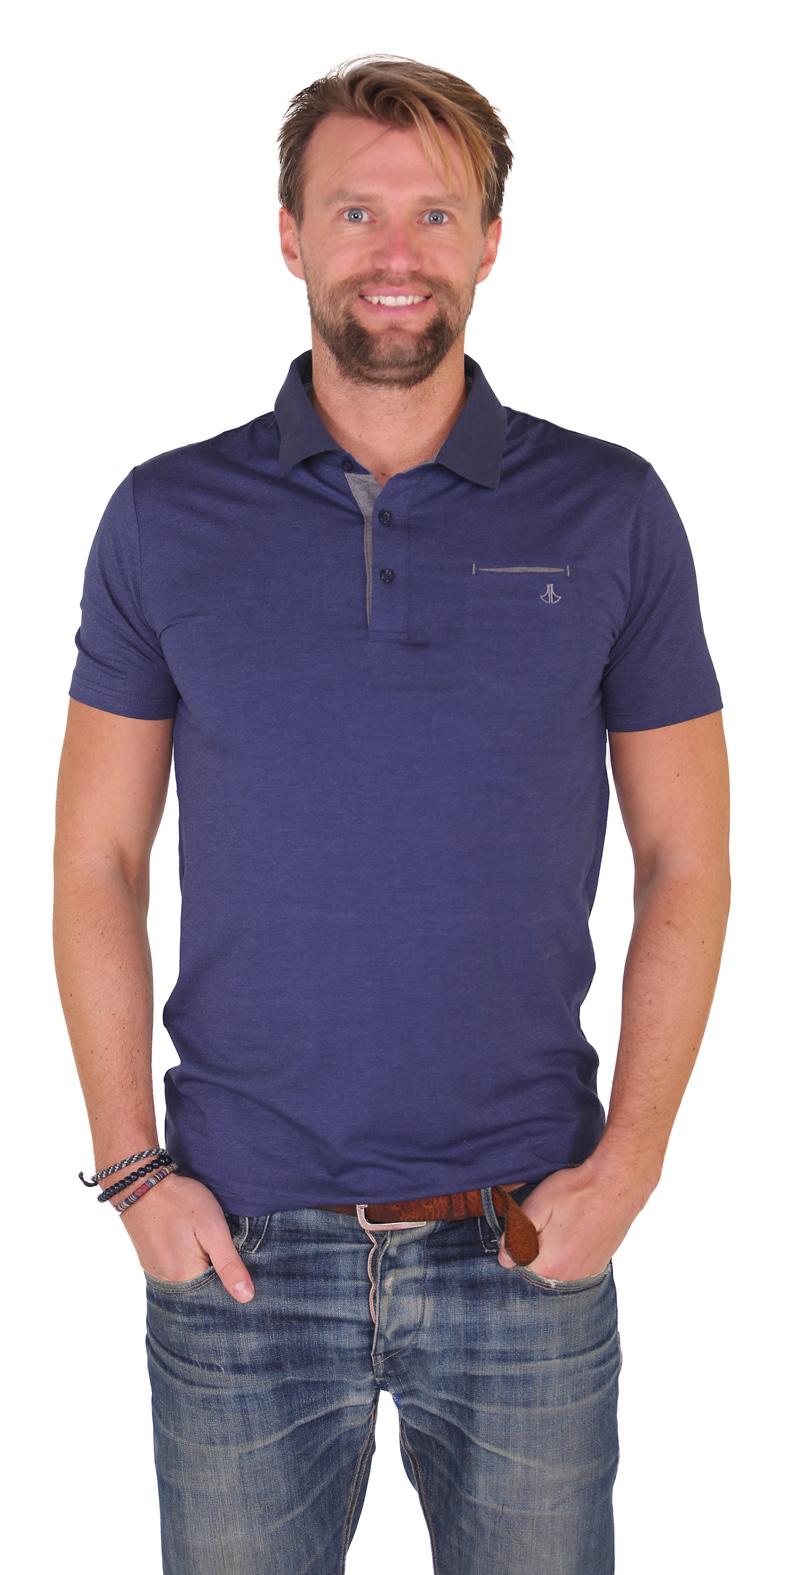 Polo Shirt Heren - Jusin